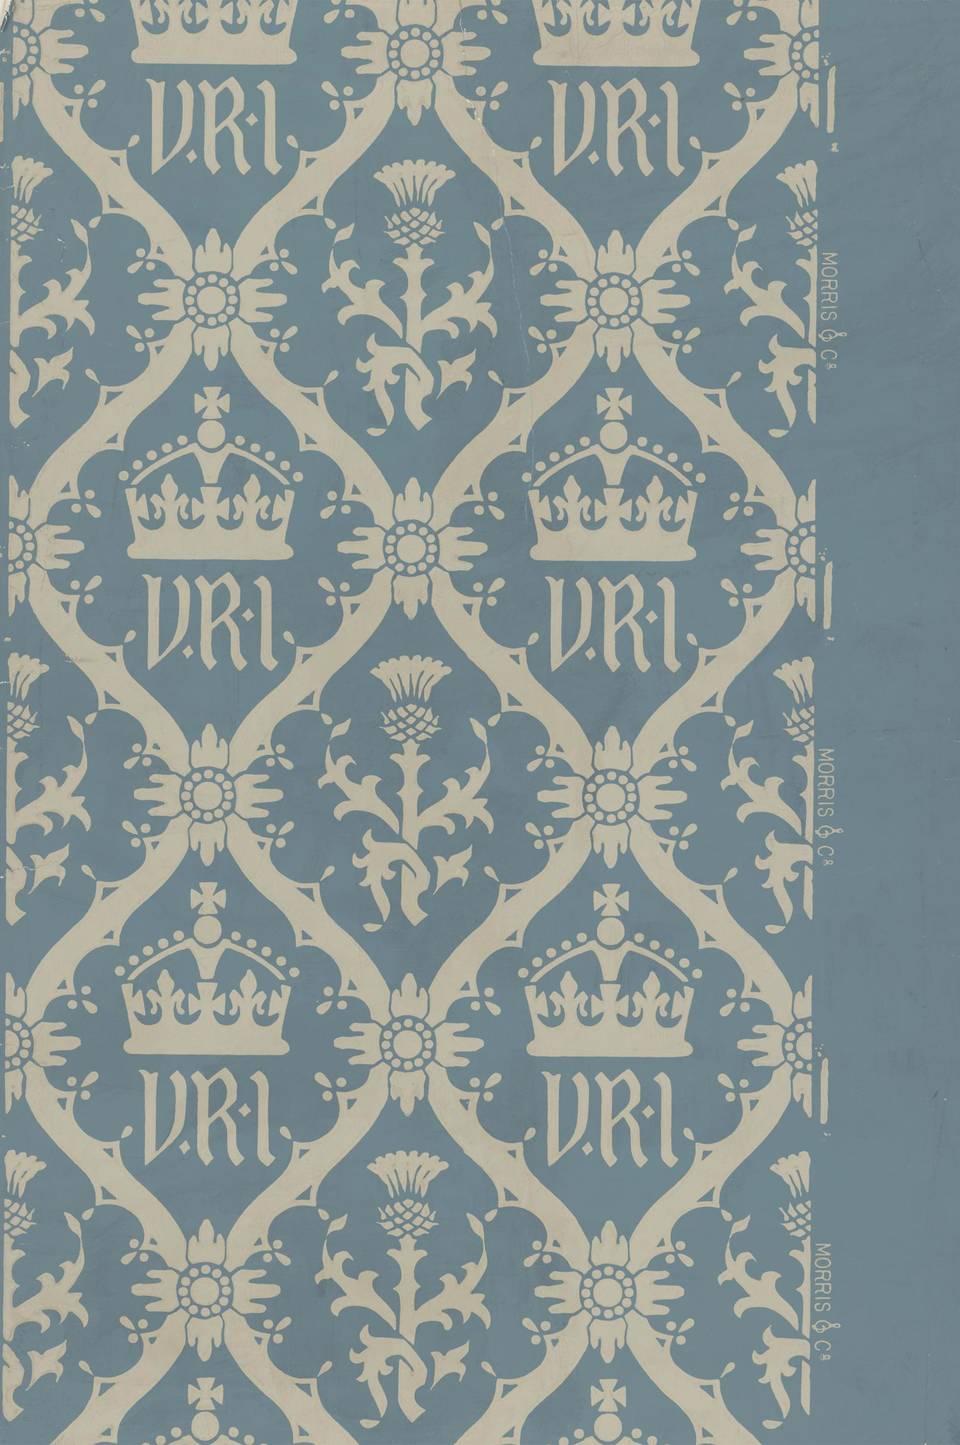 History of William Morris - Designer Wallcoverings and Fabrics